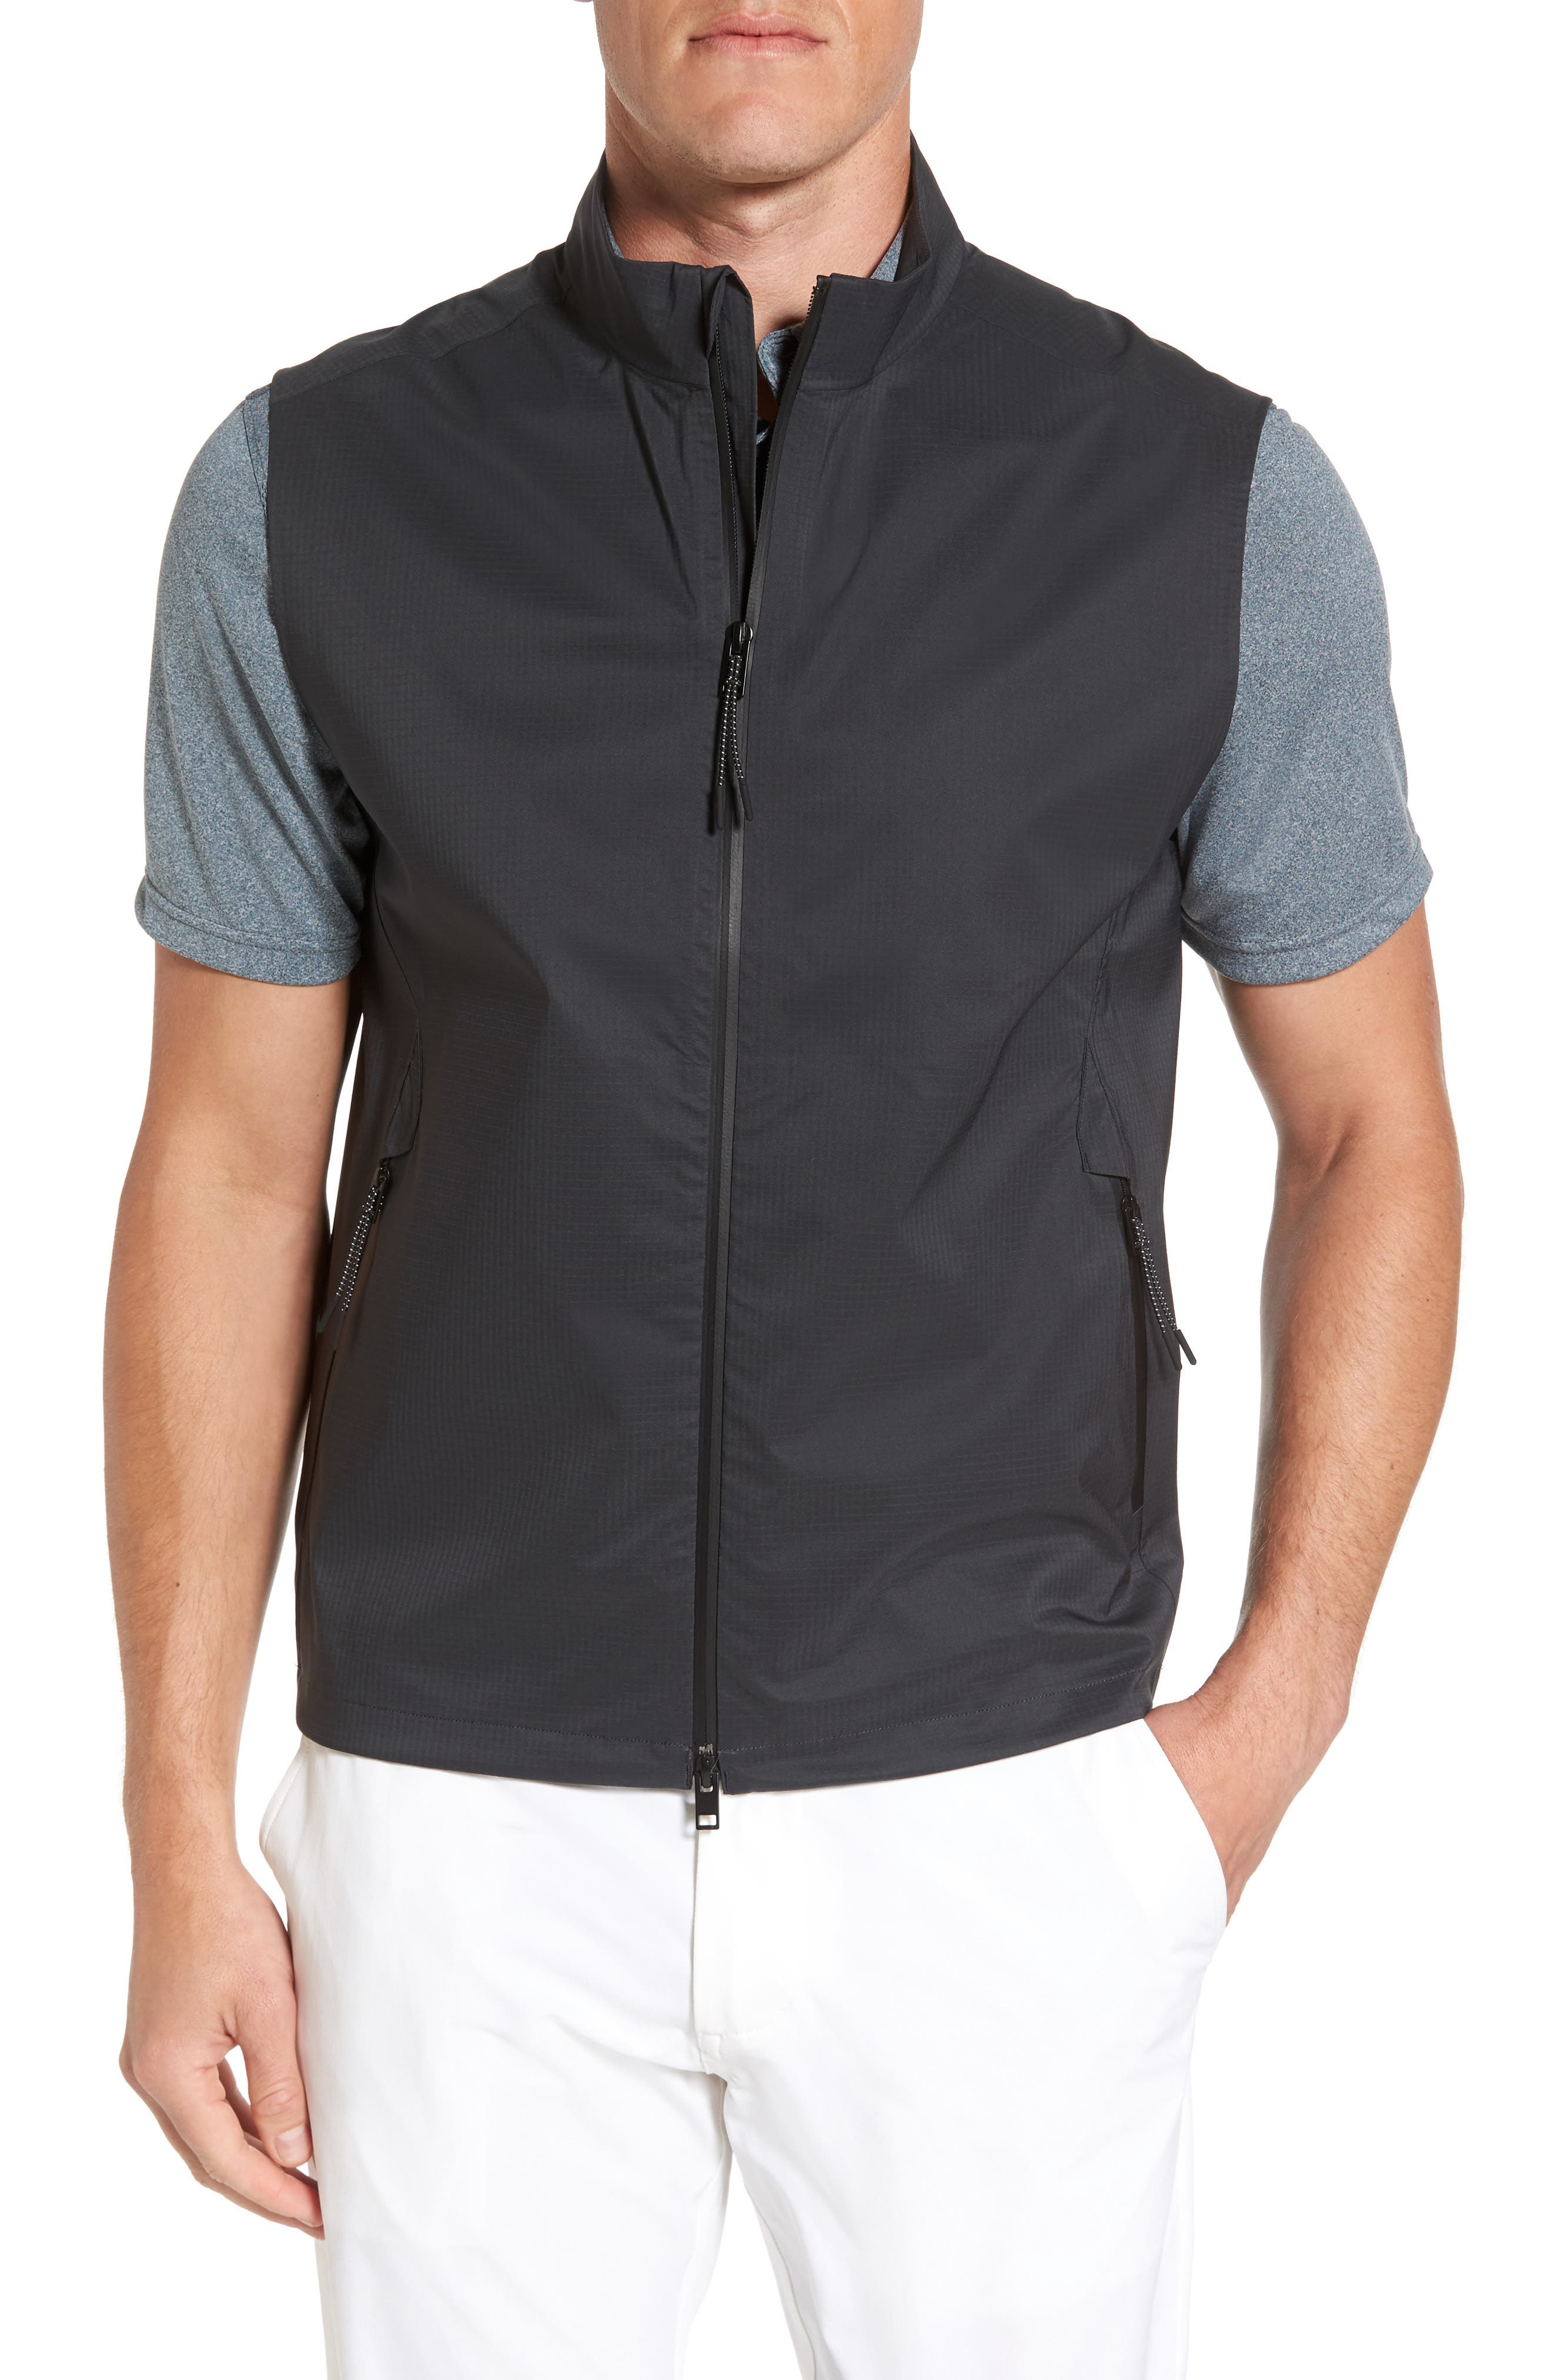 Main Image - AG Newton Ripstop Vest